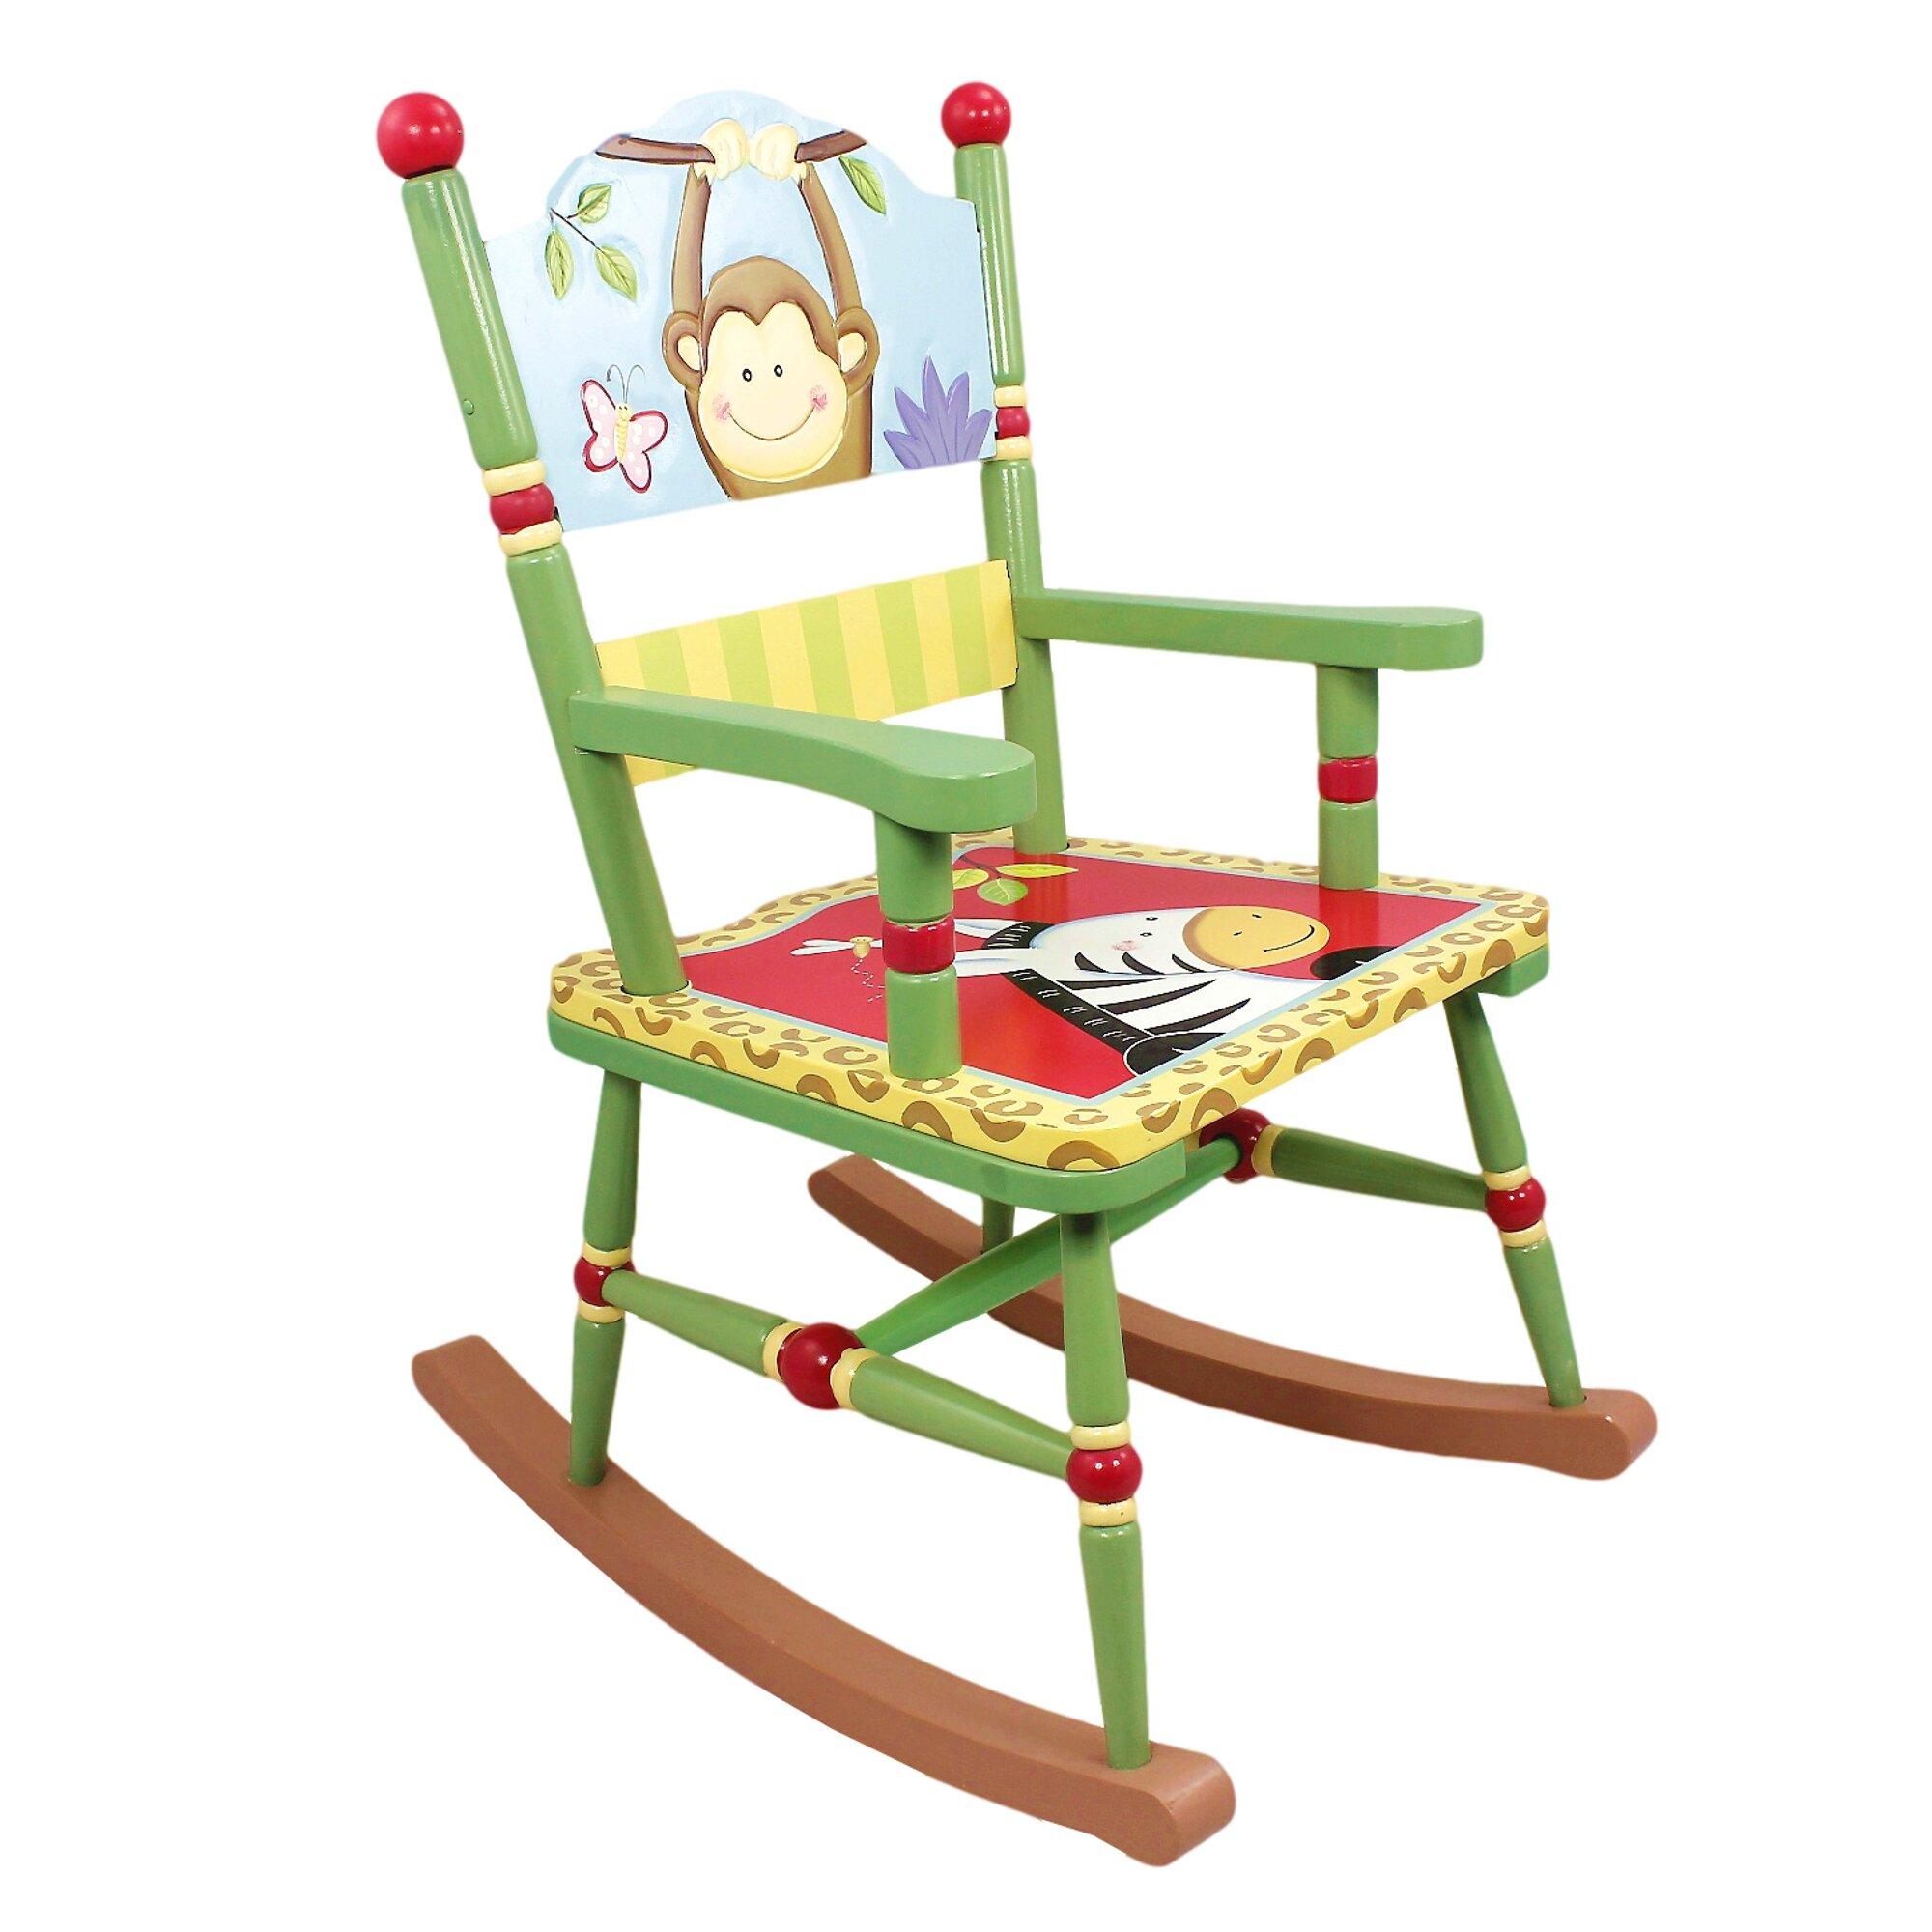 Sunny Safari Kids Rocking Chair by Fantasy Fields